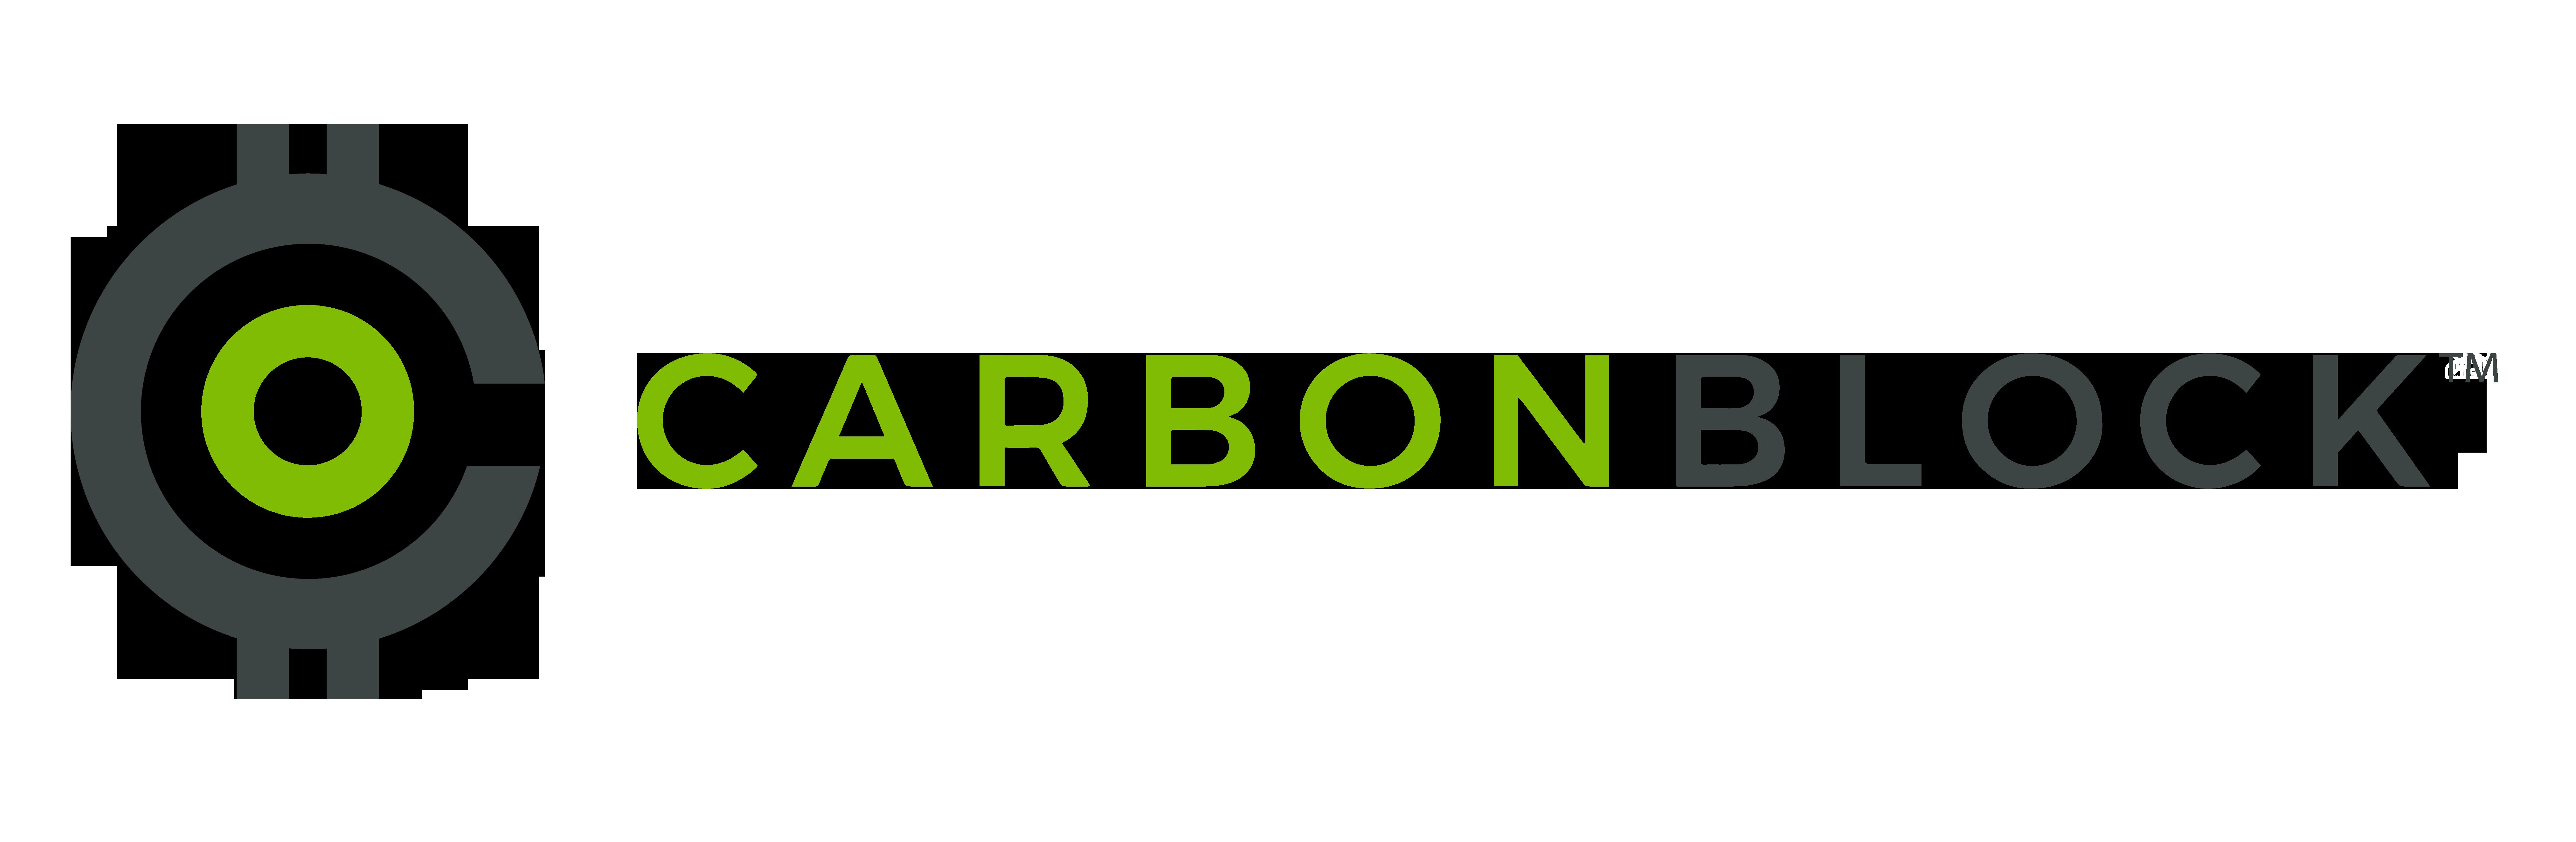 CarbonBlock-logo horizontal